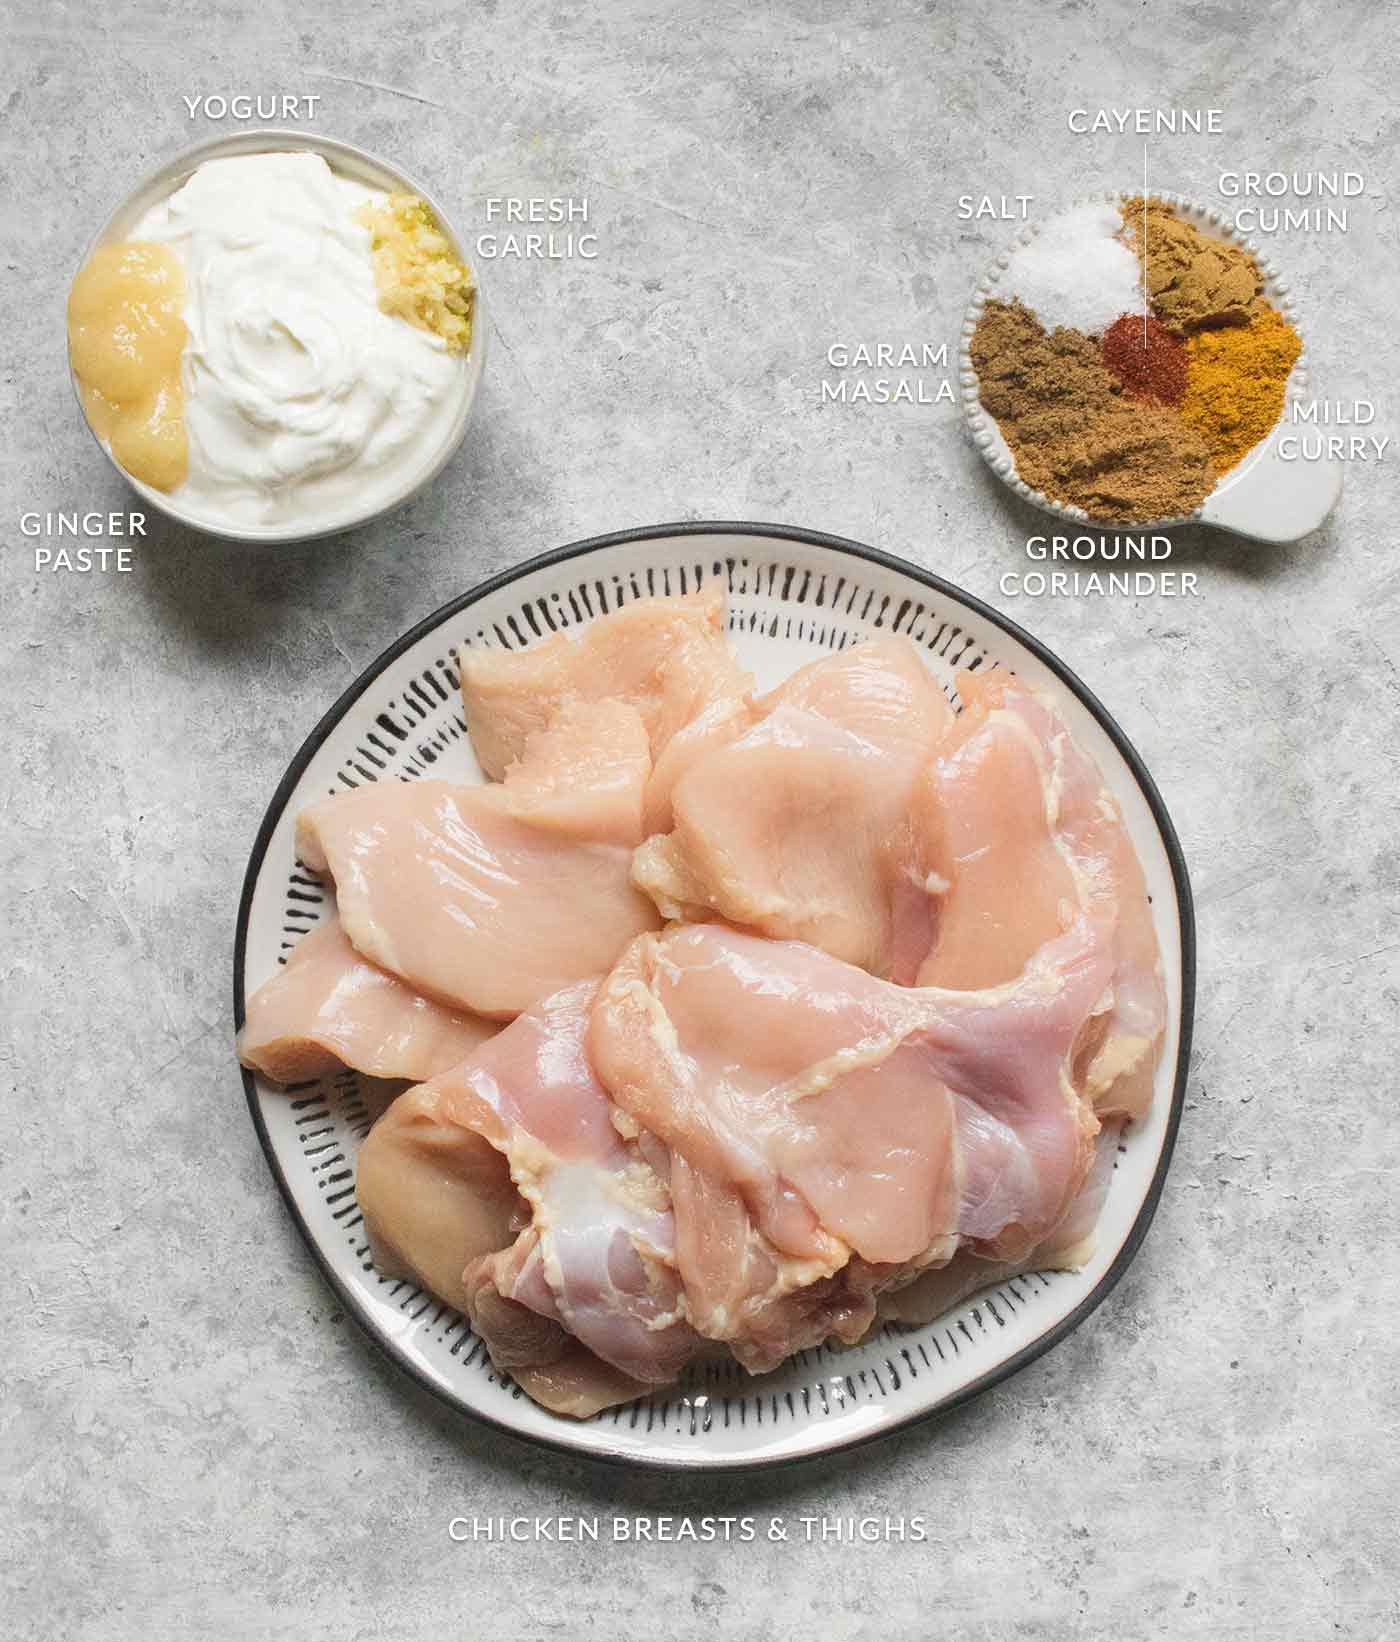 Seasoning ingredients for the chicken